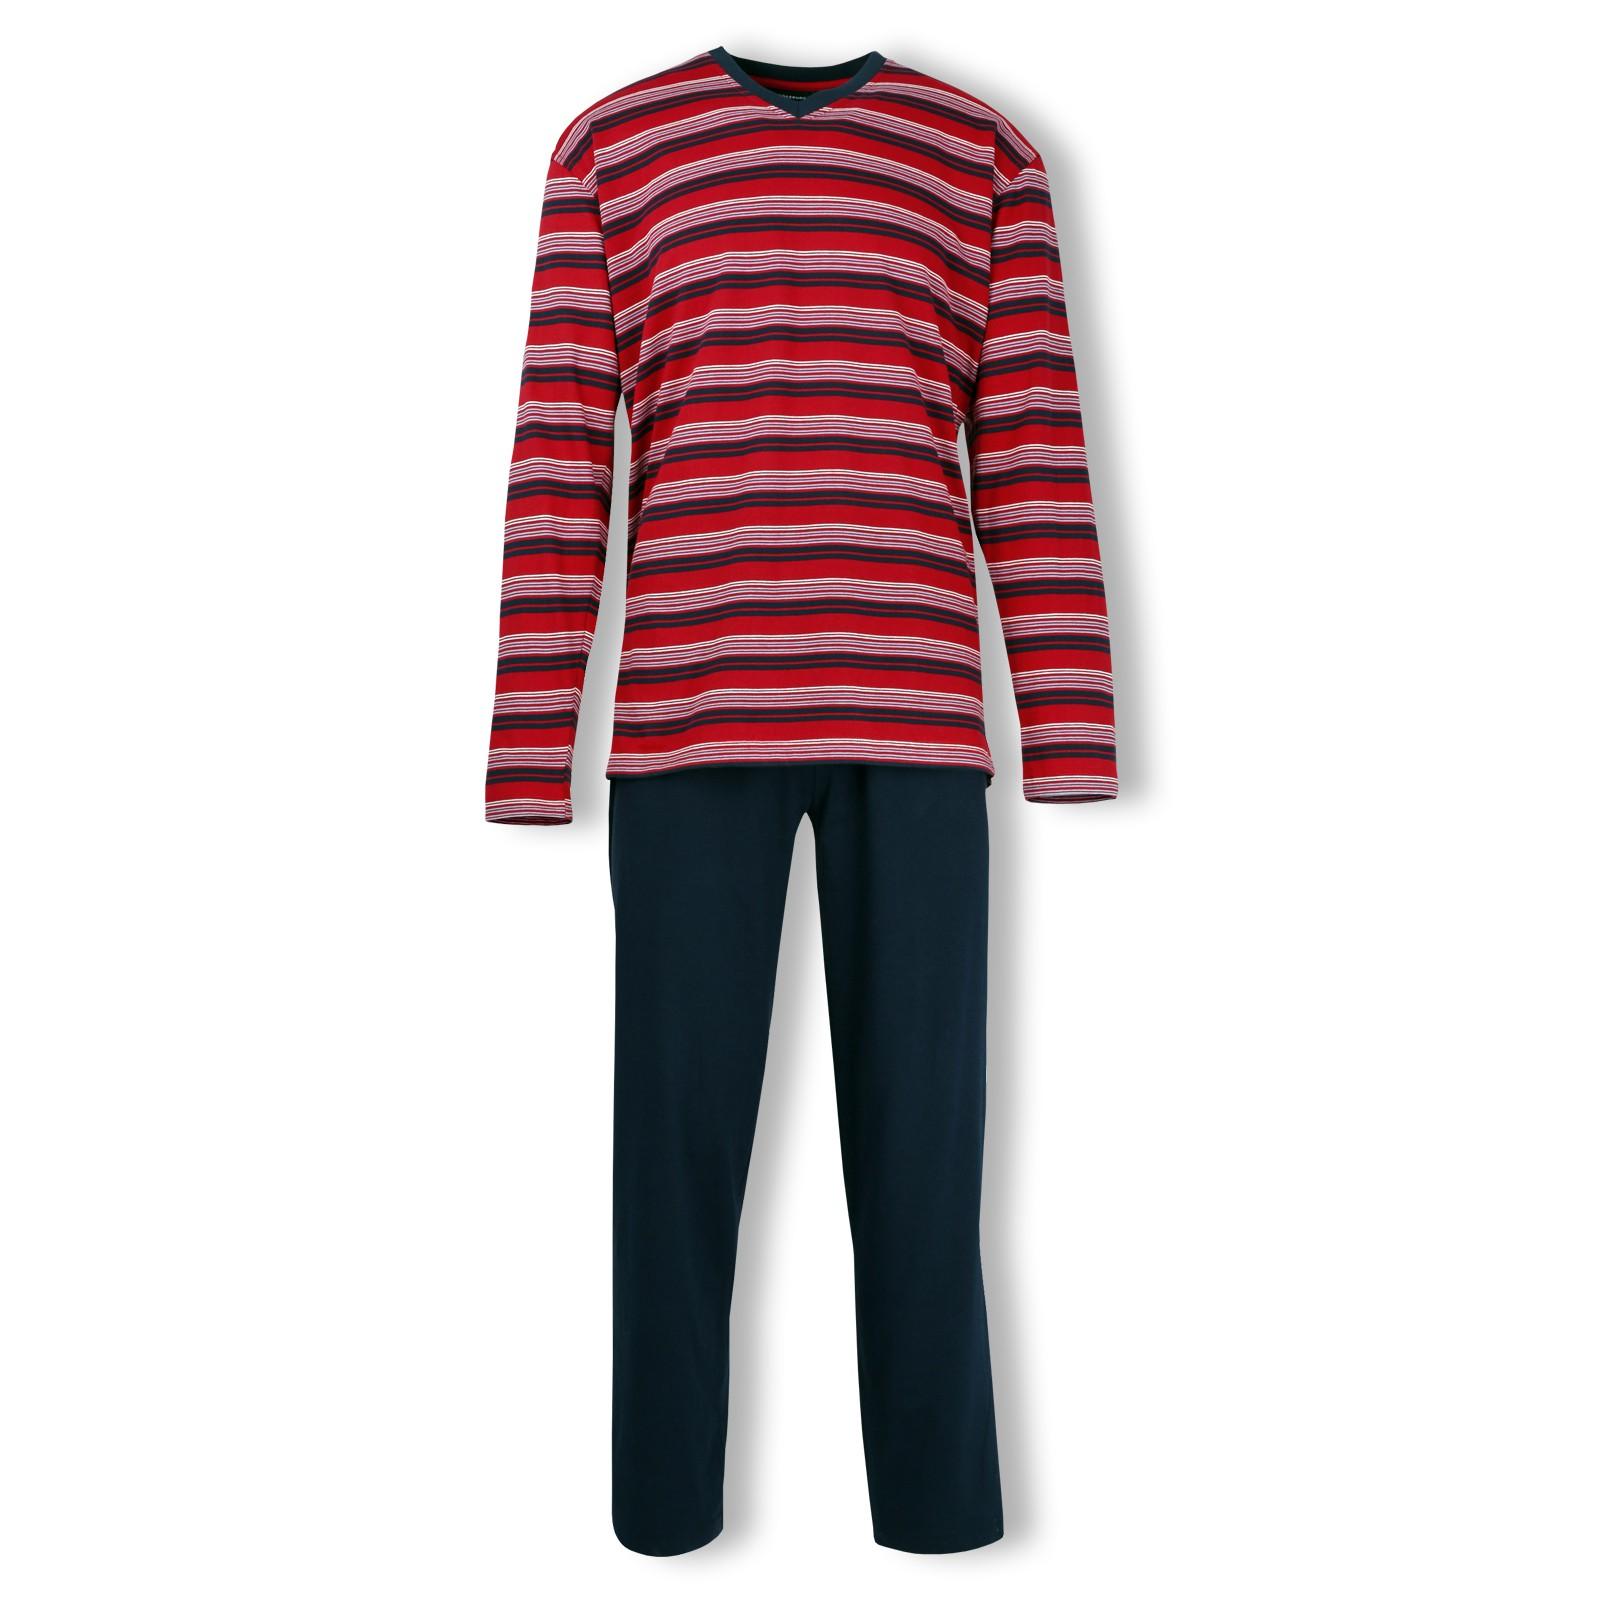 Götzburg Herren Pyjama Schlafanzug langarm Klima Aktiv S M L XL 2XL 3XL 4XL 451635 in chili-blue